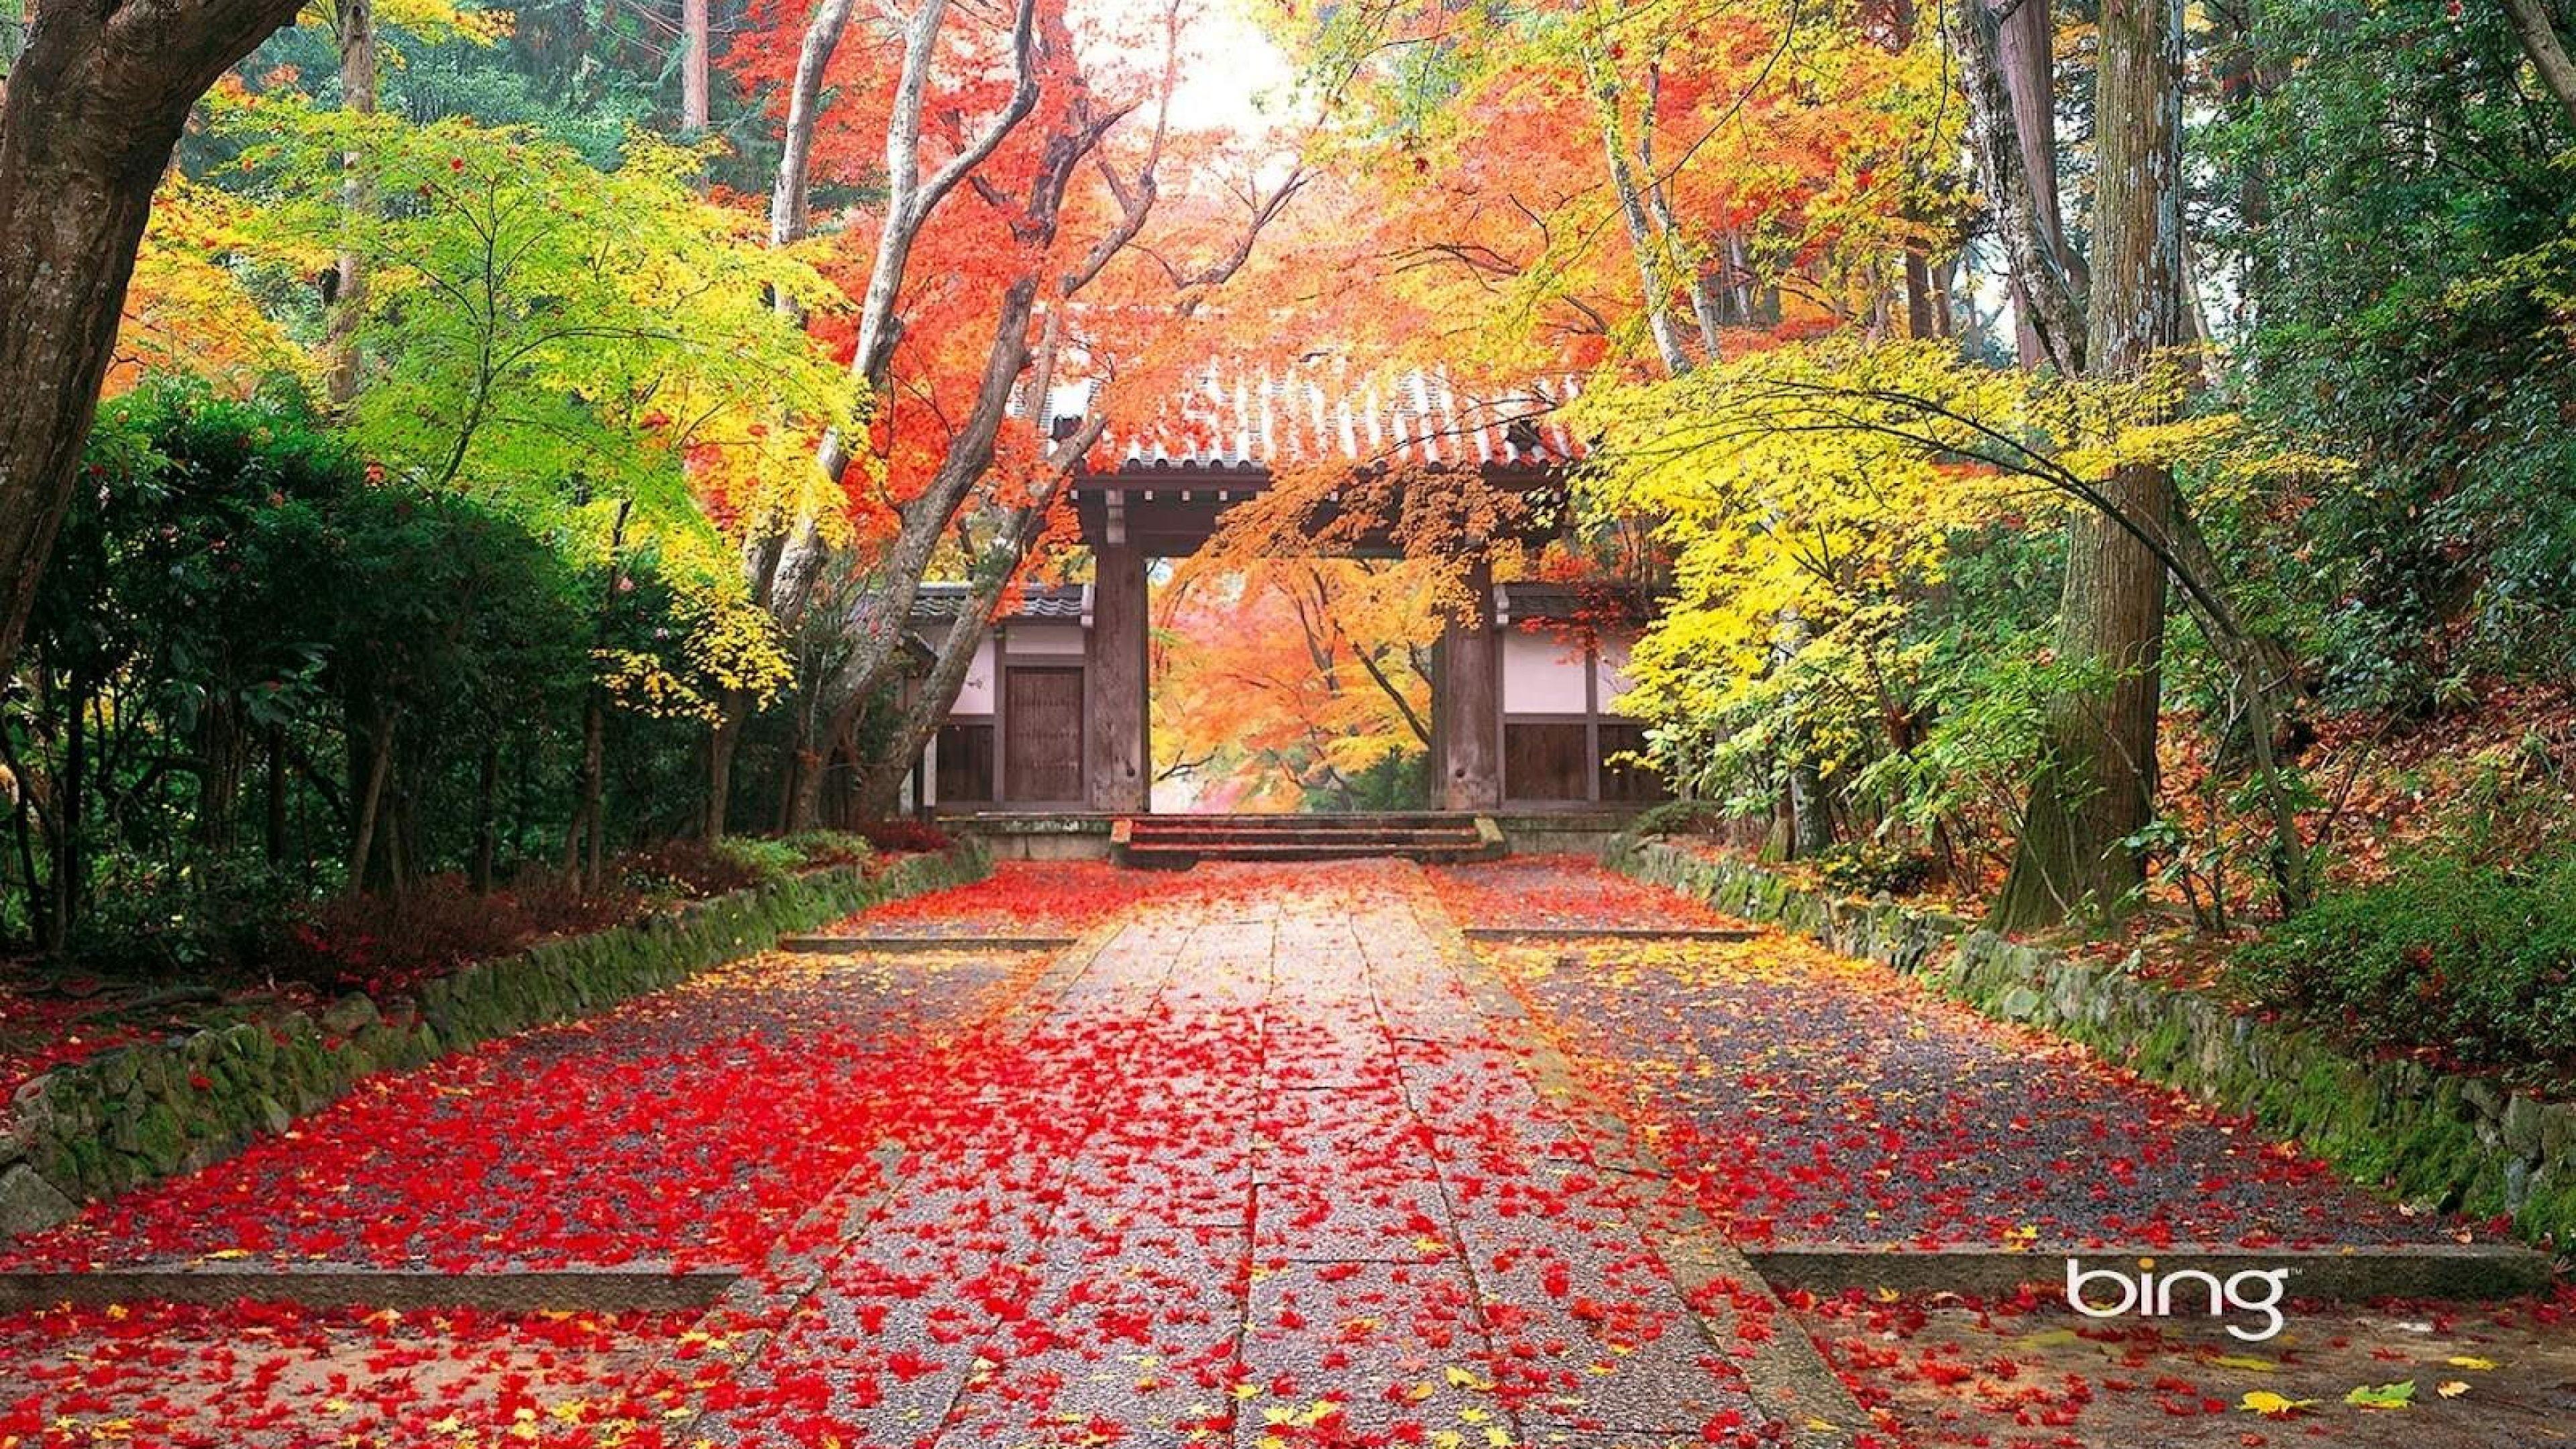 Autumn desktop wallpaper ·① Download free stunning full HD ...